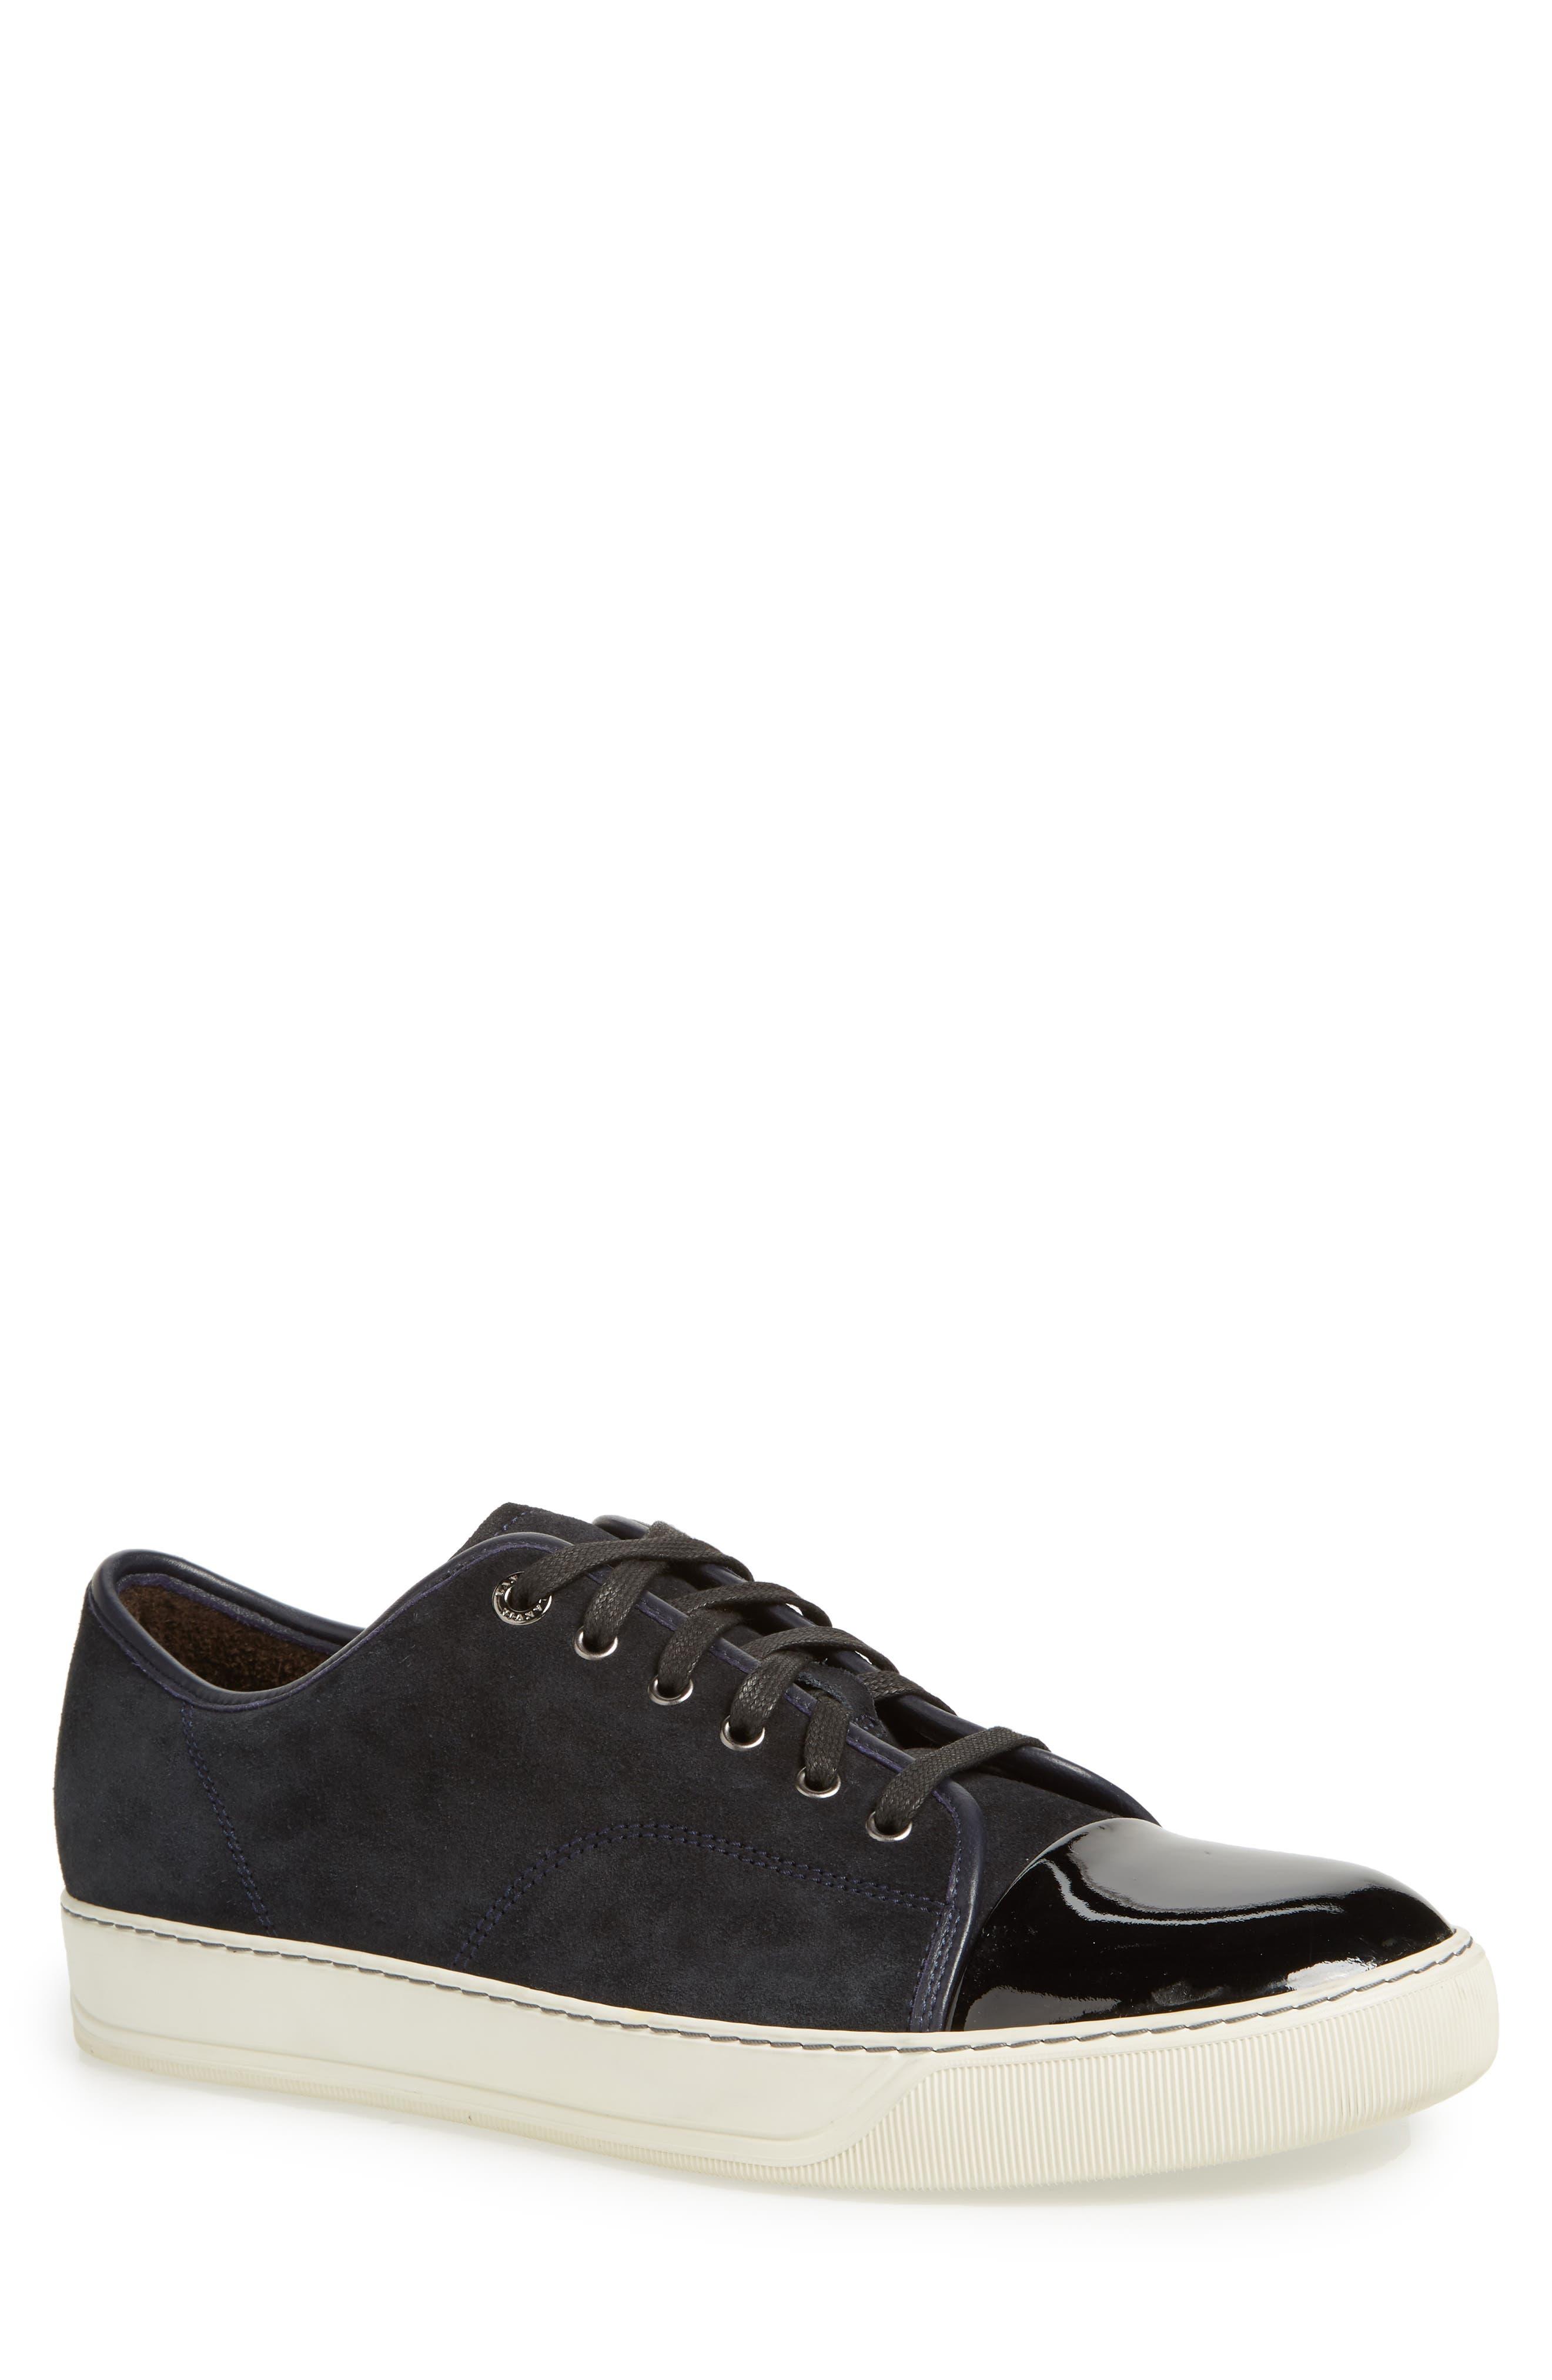 Low Top Suede Sneaker,                         Main,                         color, 024